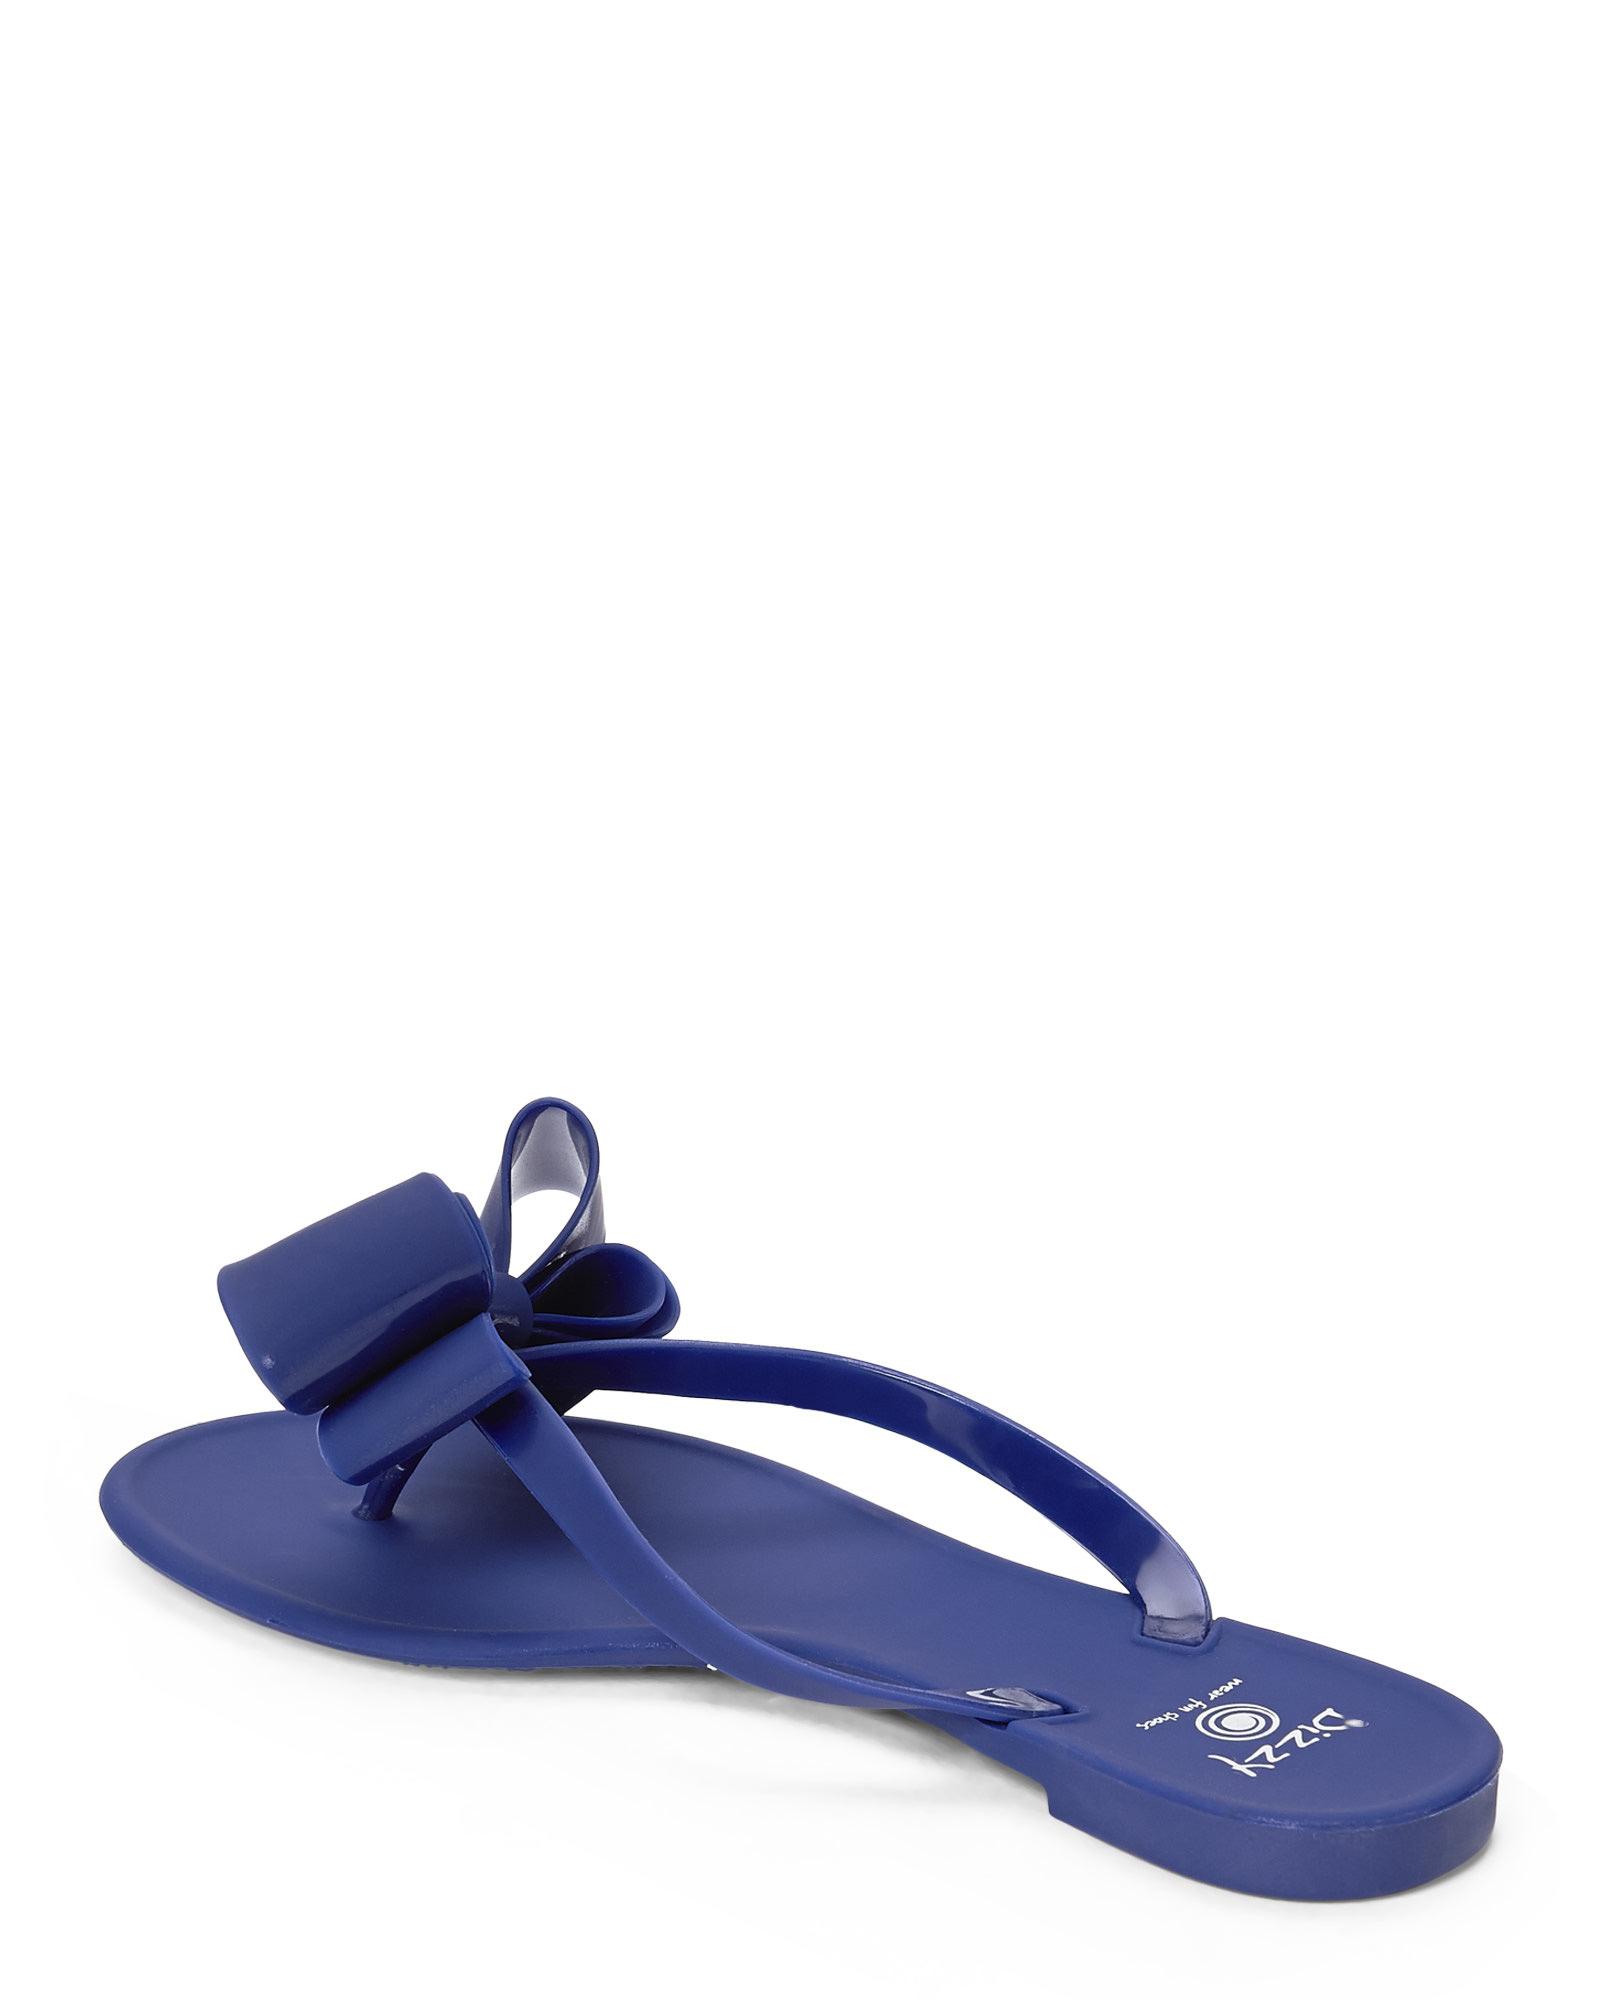 91612d499c8b6 Lyst - Dizzy Matte Bow Thong Sandals in Blue